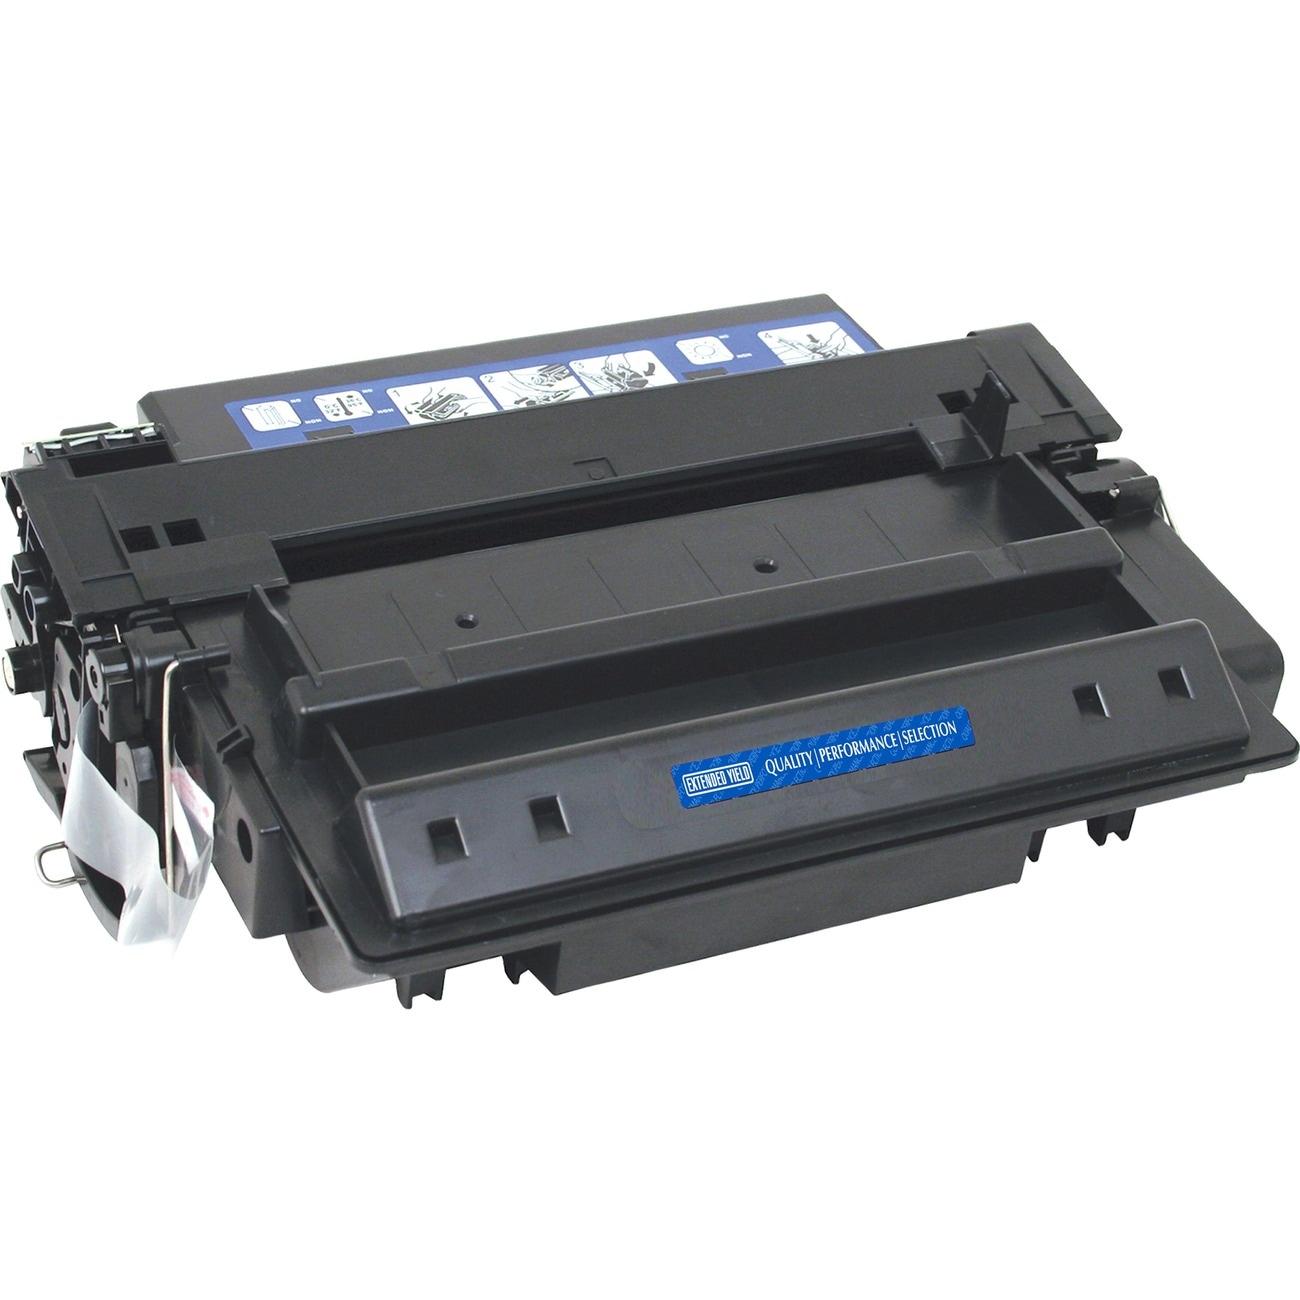 V7 Toner Cartridge - Remanufactured for HP (Q7551X) - Black